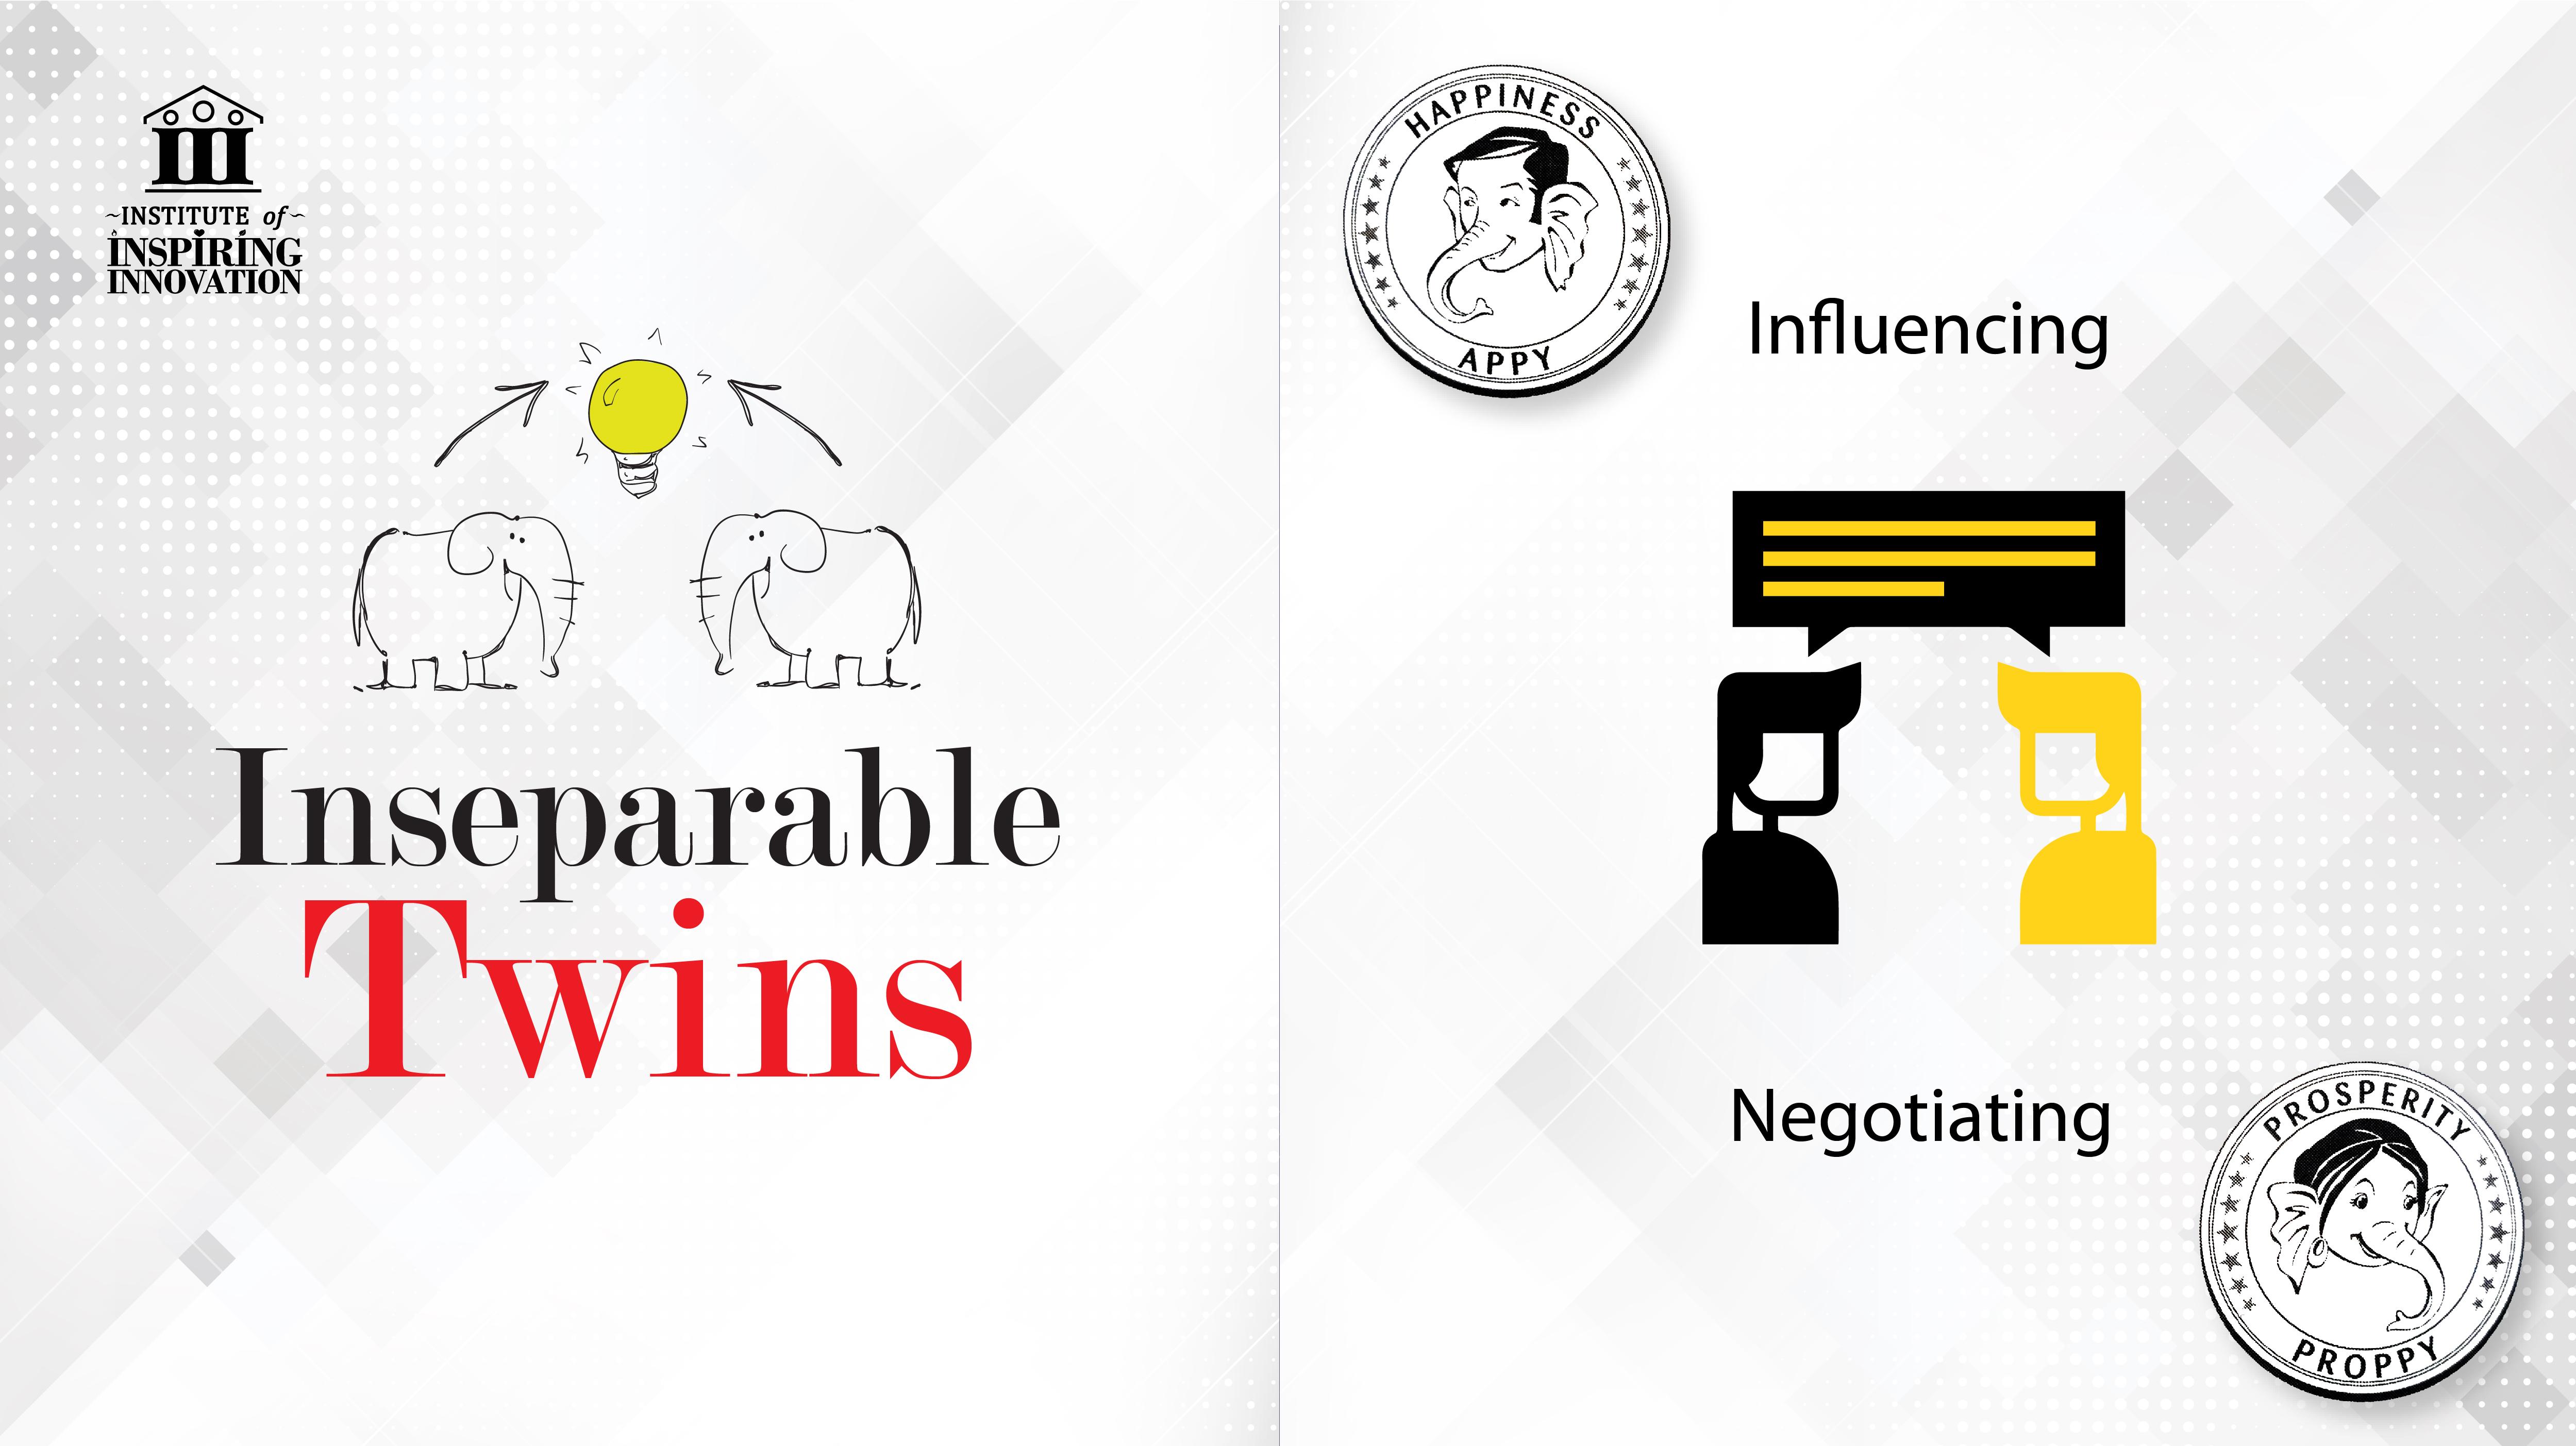 Influence-negotiate